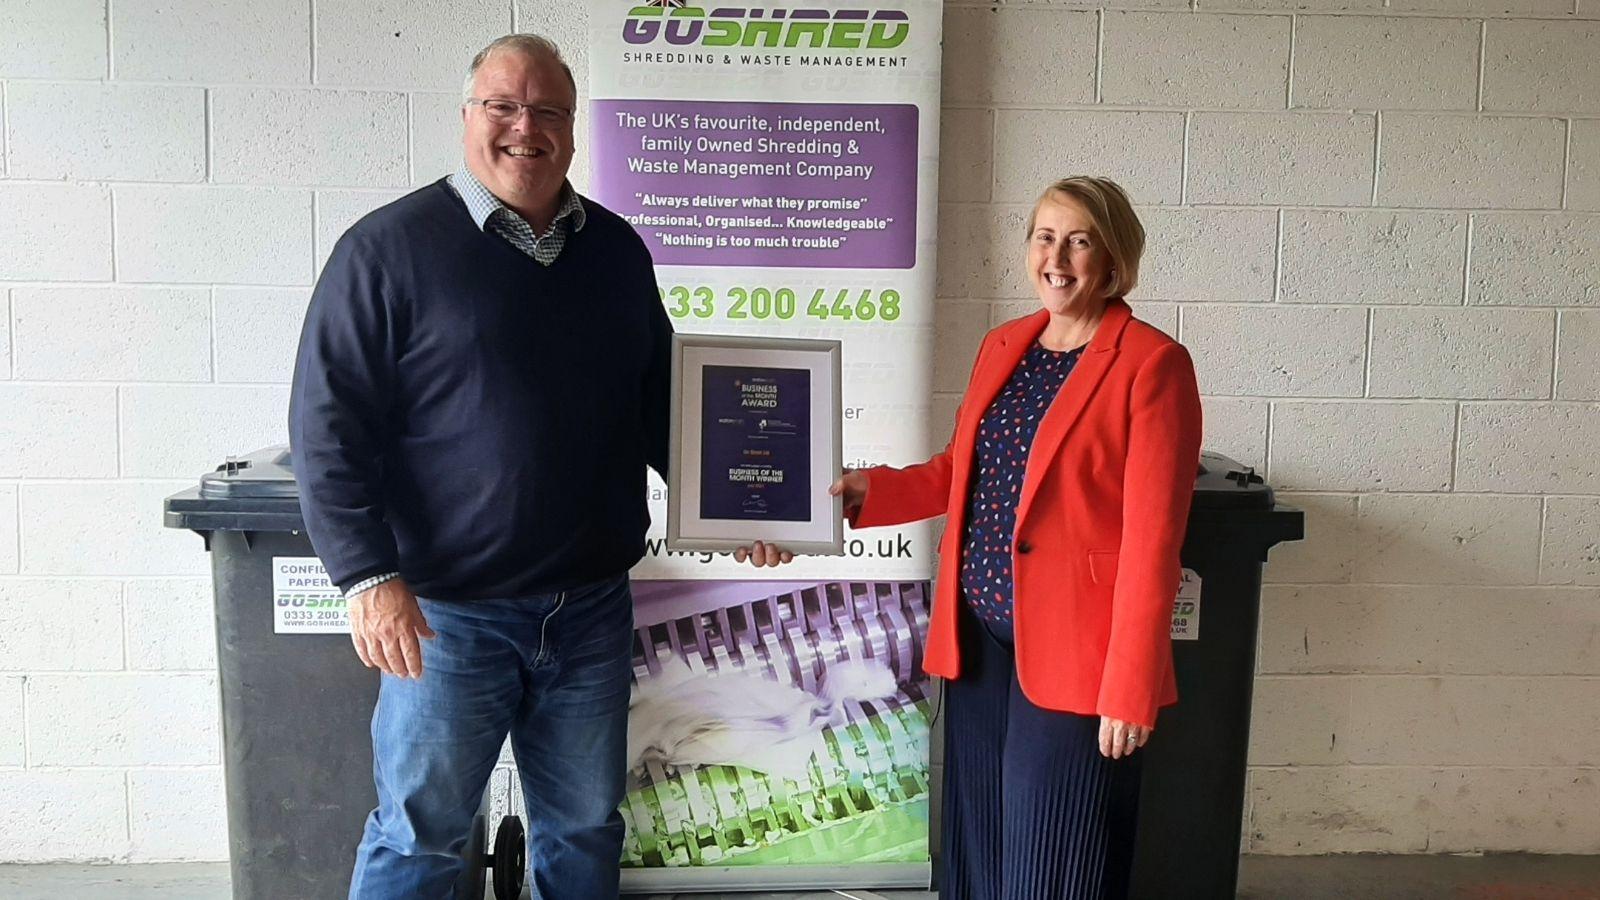 Go Shred win prestigious Business of the Month Award